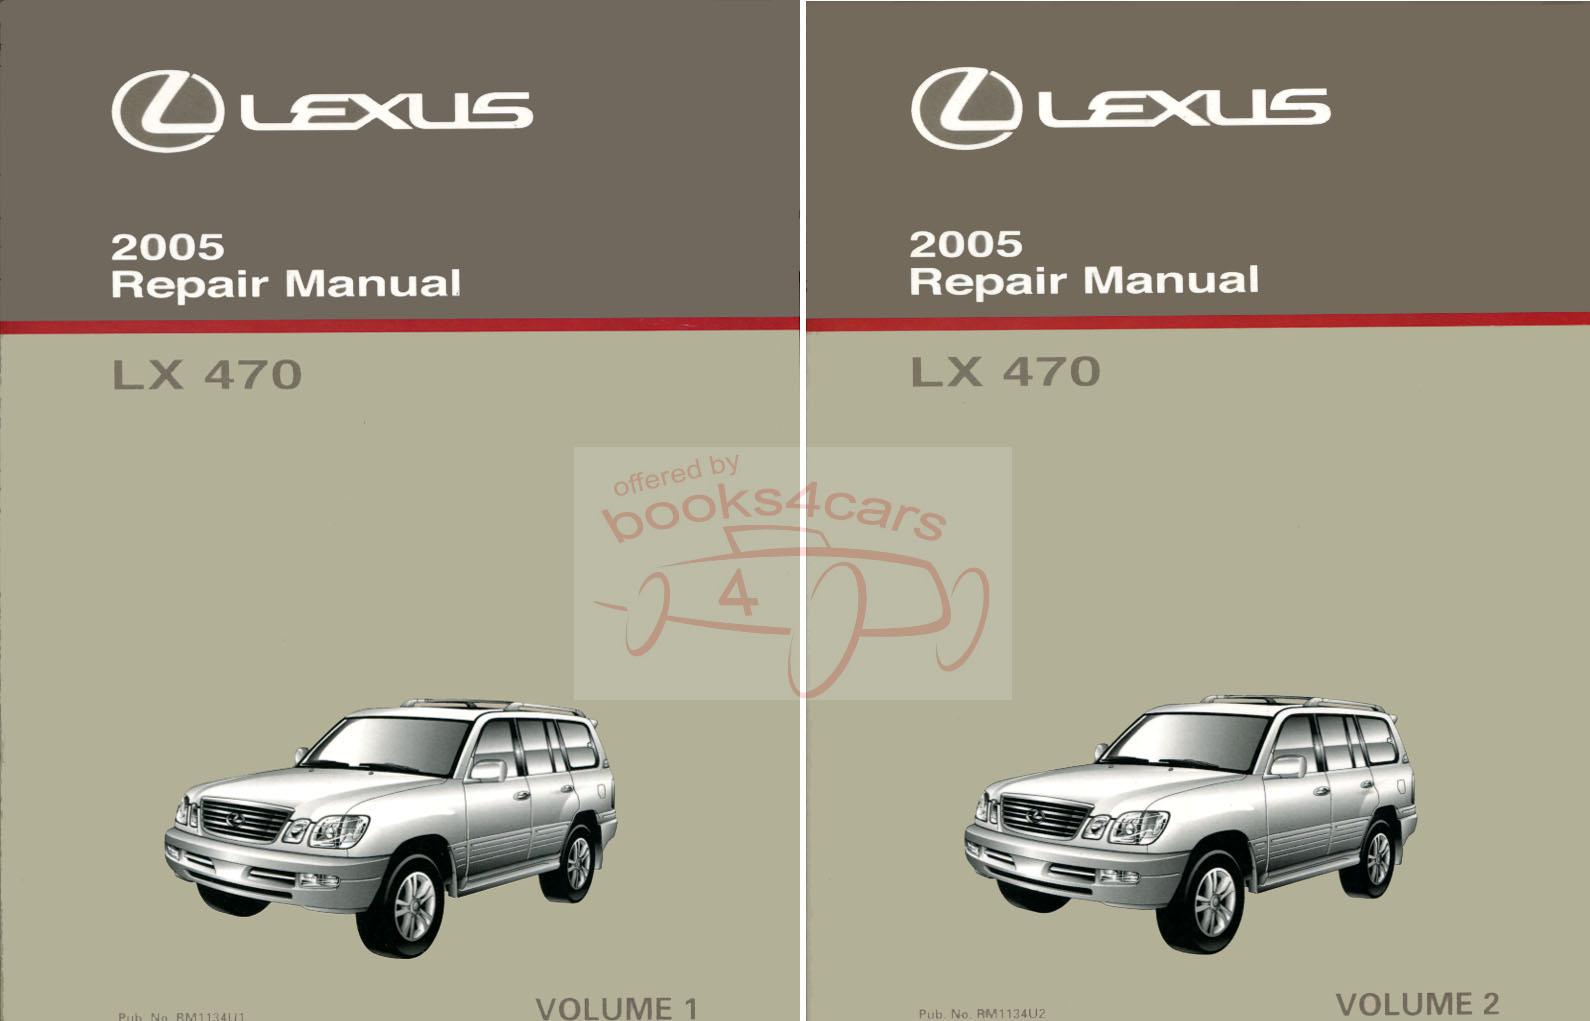 Toyota Truck Manuals At Books4cars Com